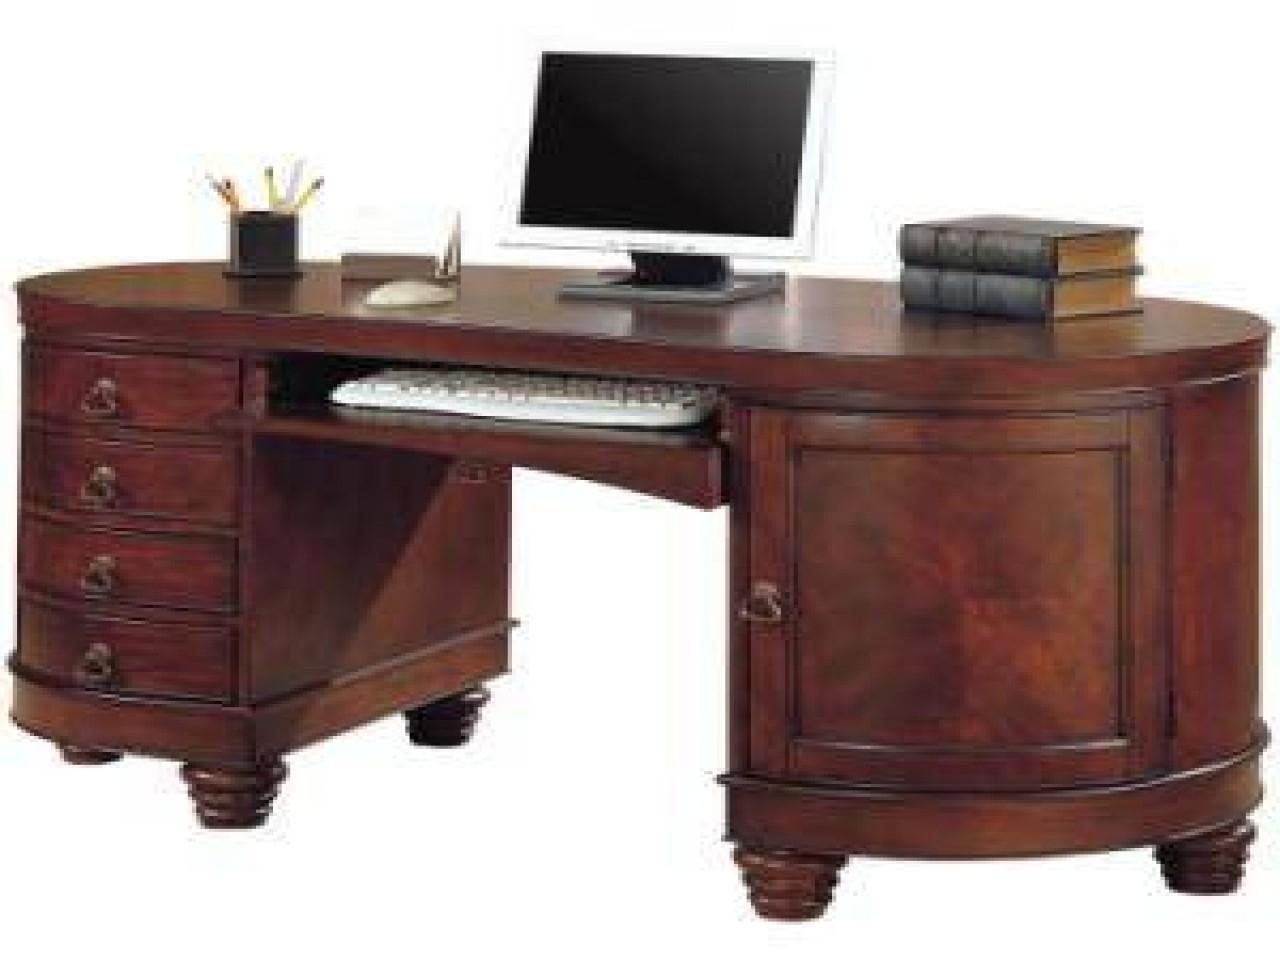 2019 Antique Computer Desks Antique Furniture – Ashley Furniture Pertaining To Antique Computer Desks (View 9 of 20)